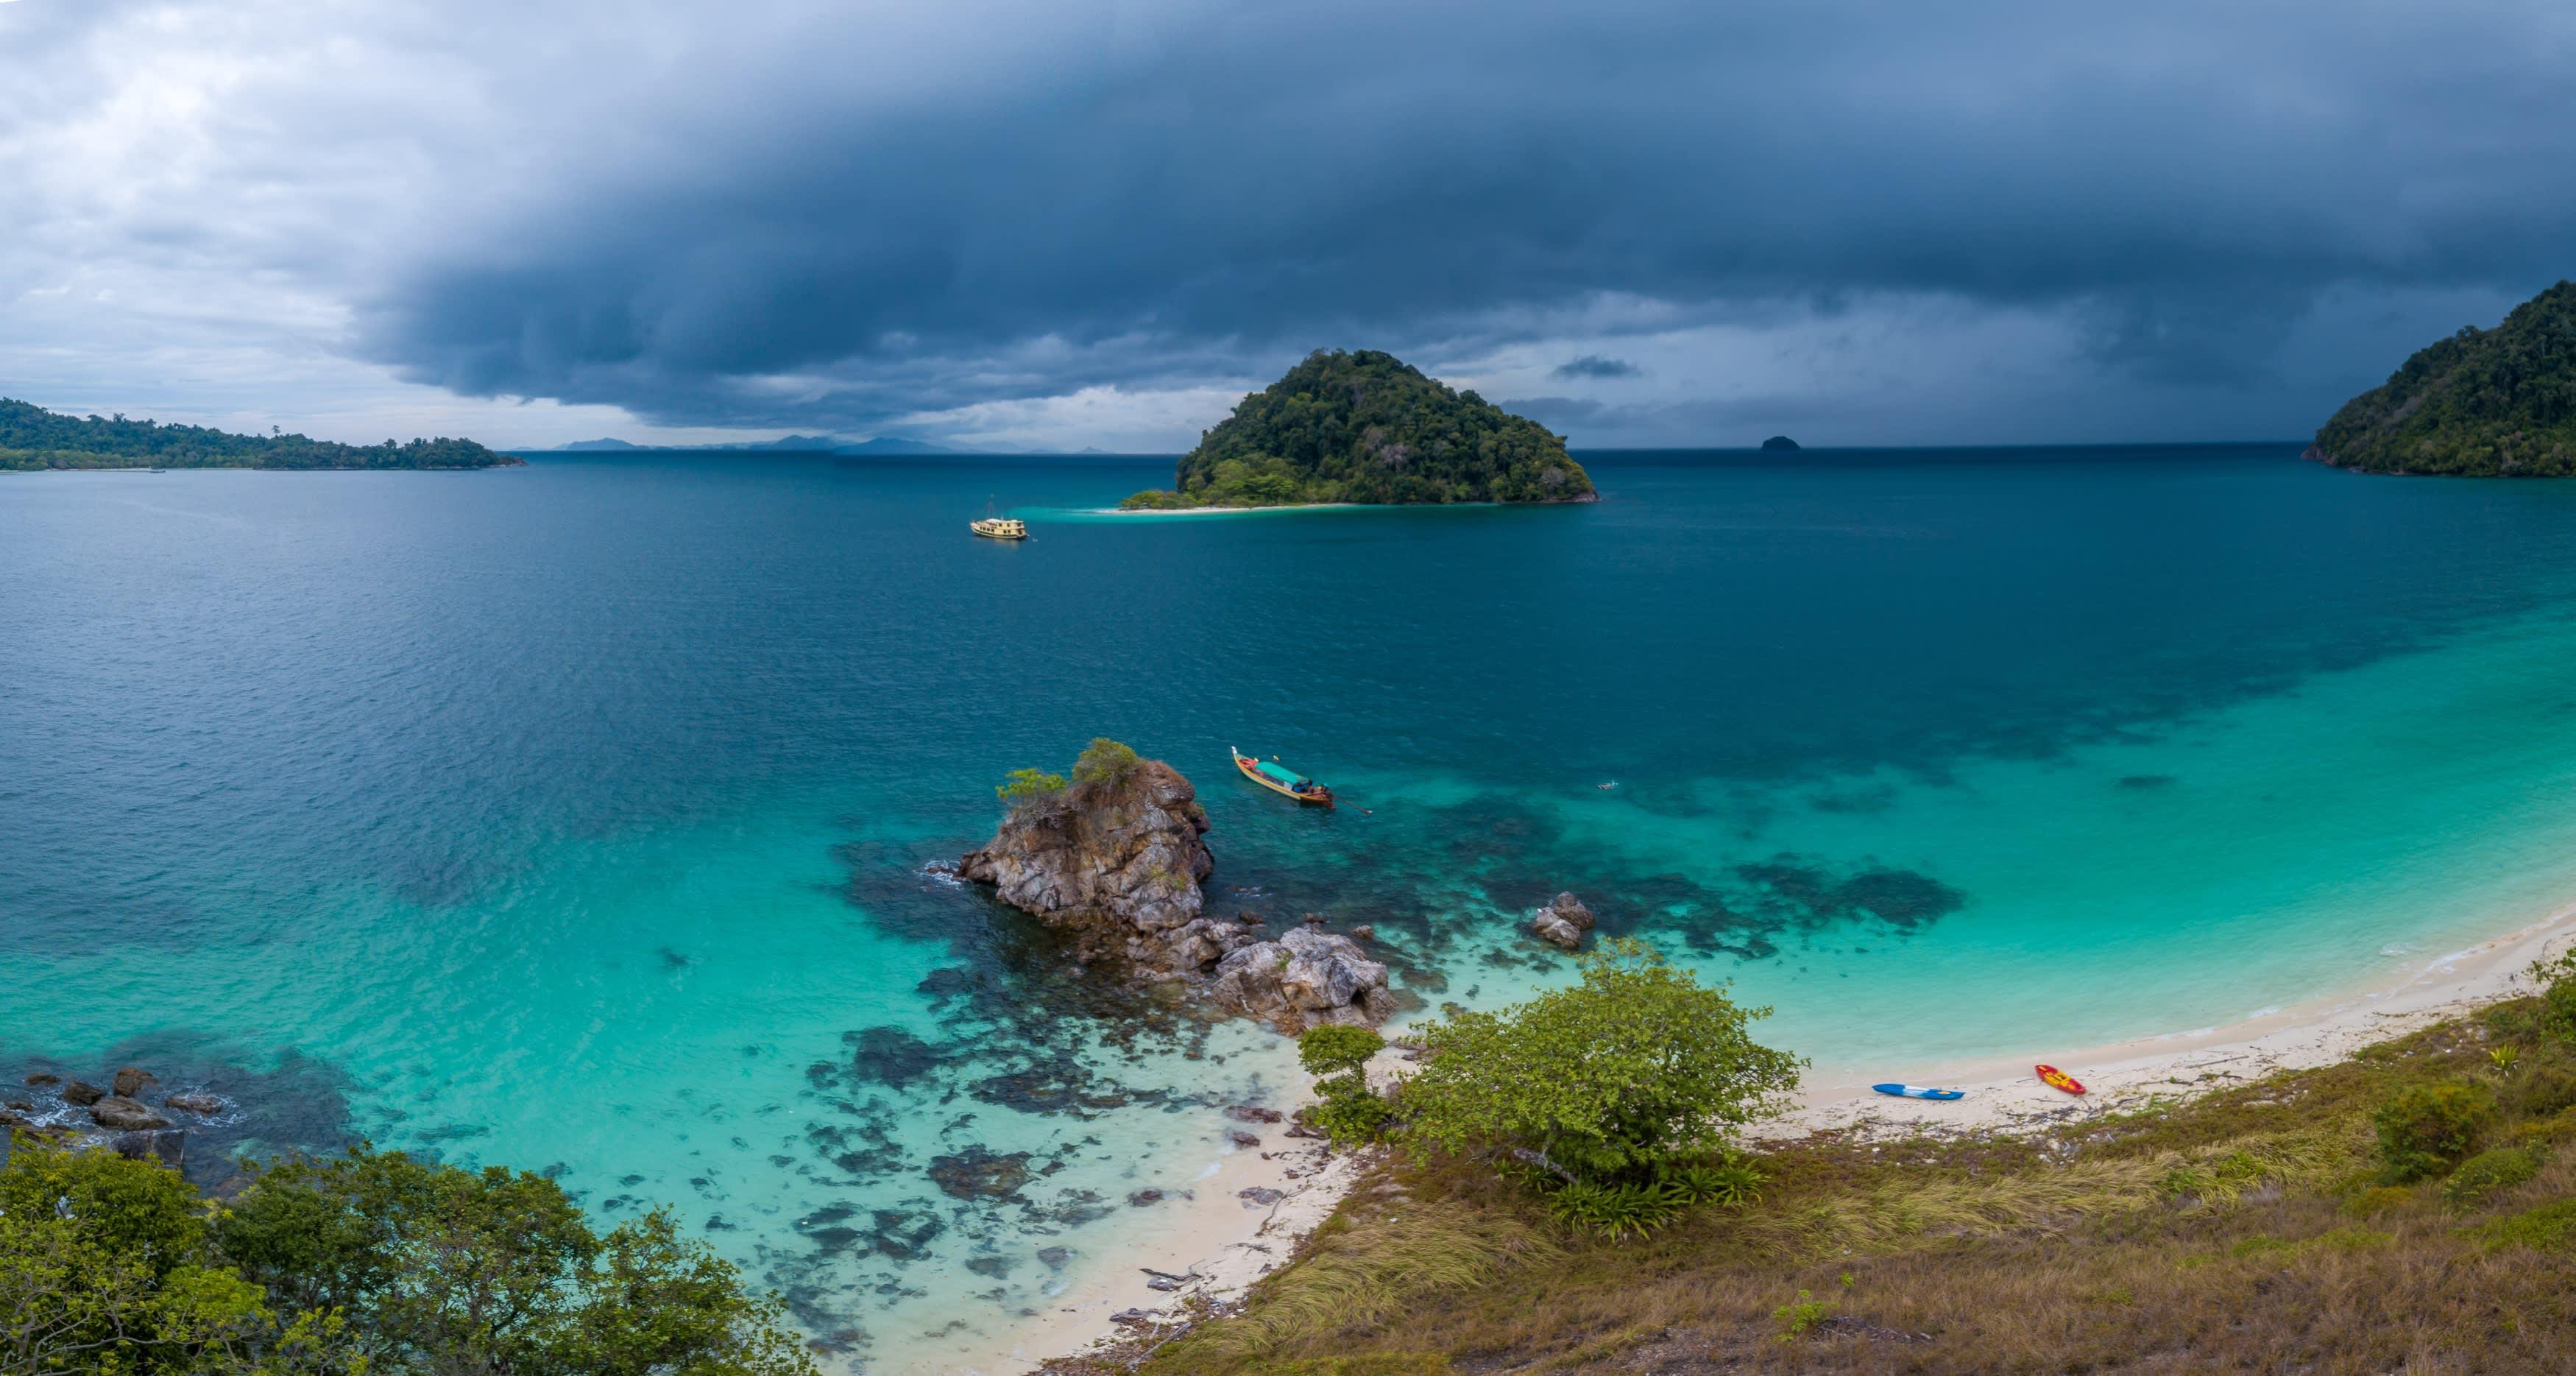 Myanmar's eco-resorts open up Asia's new tourism frontier